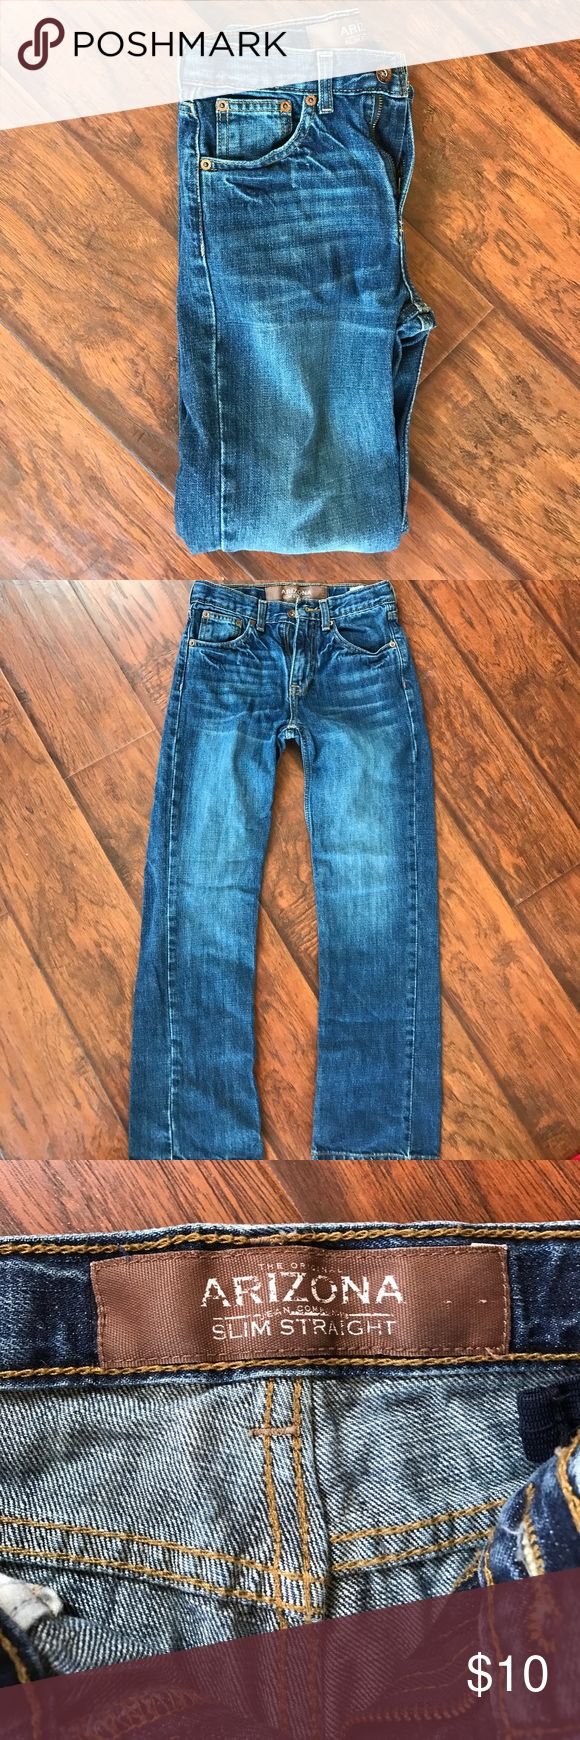 Boys Arizona jeans 12 slim Boys Arizona jeans size 12 slim with adjustable waist Arizona Jean Company Bottoms Jeans